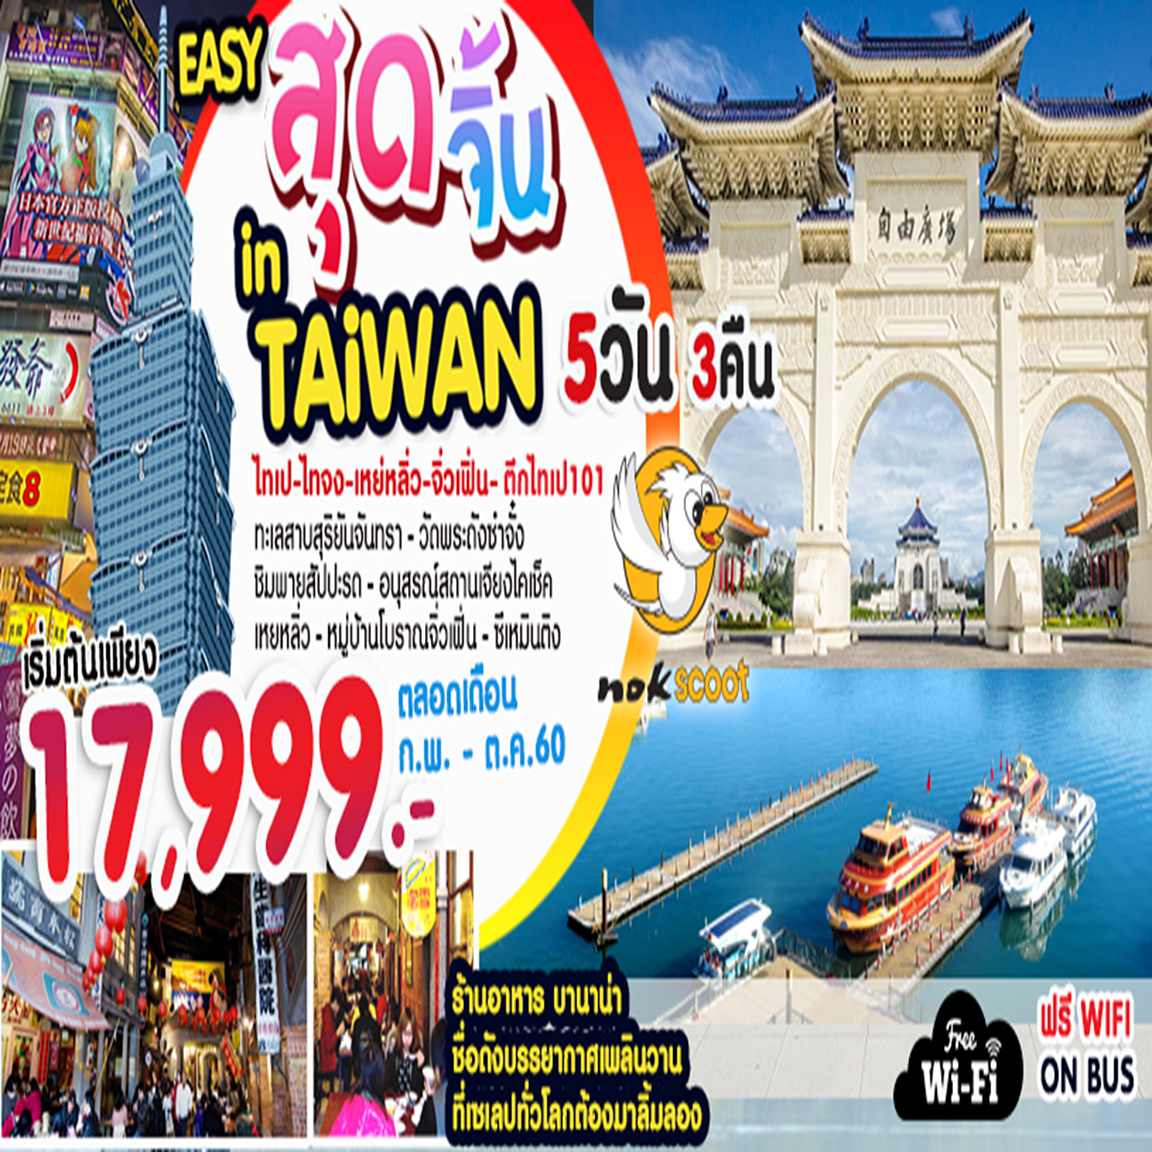 TW08 EASY สุดจิ้น IN TAIWAN 5D 3N BY XW (ก.พ. - ต.ค. 60)